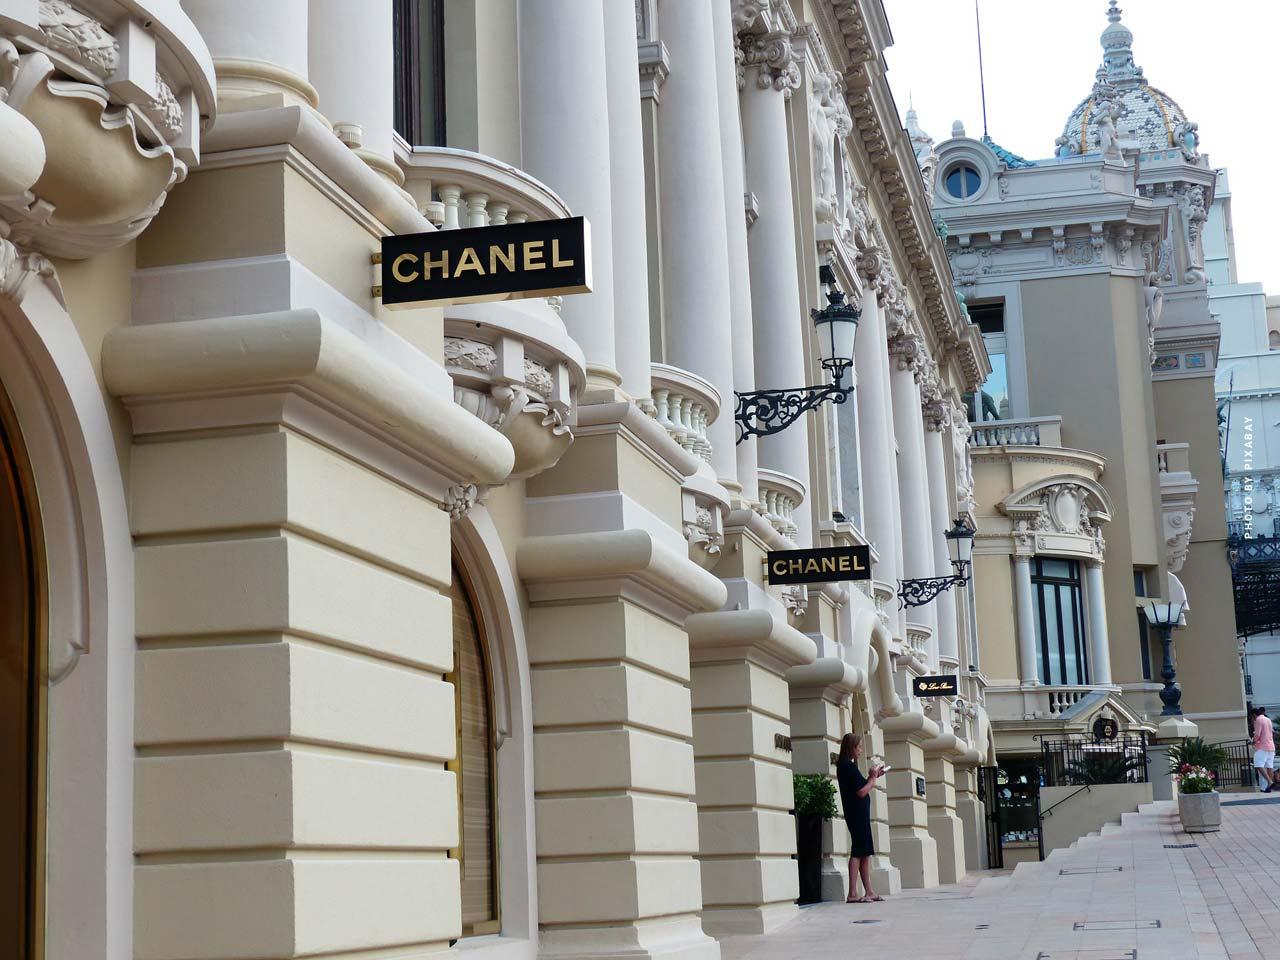 Chanel : N°5, sac, chaîne, lunettes & plus - Fashion by Coco Chanel & Karl Lagerfeld